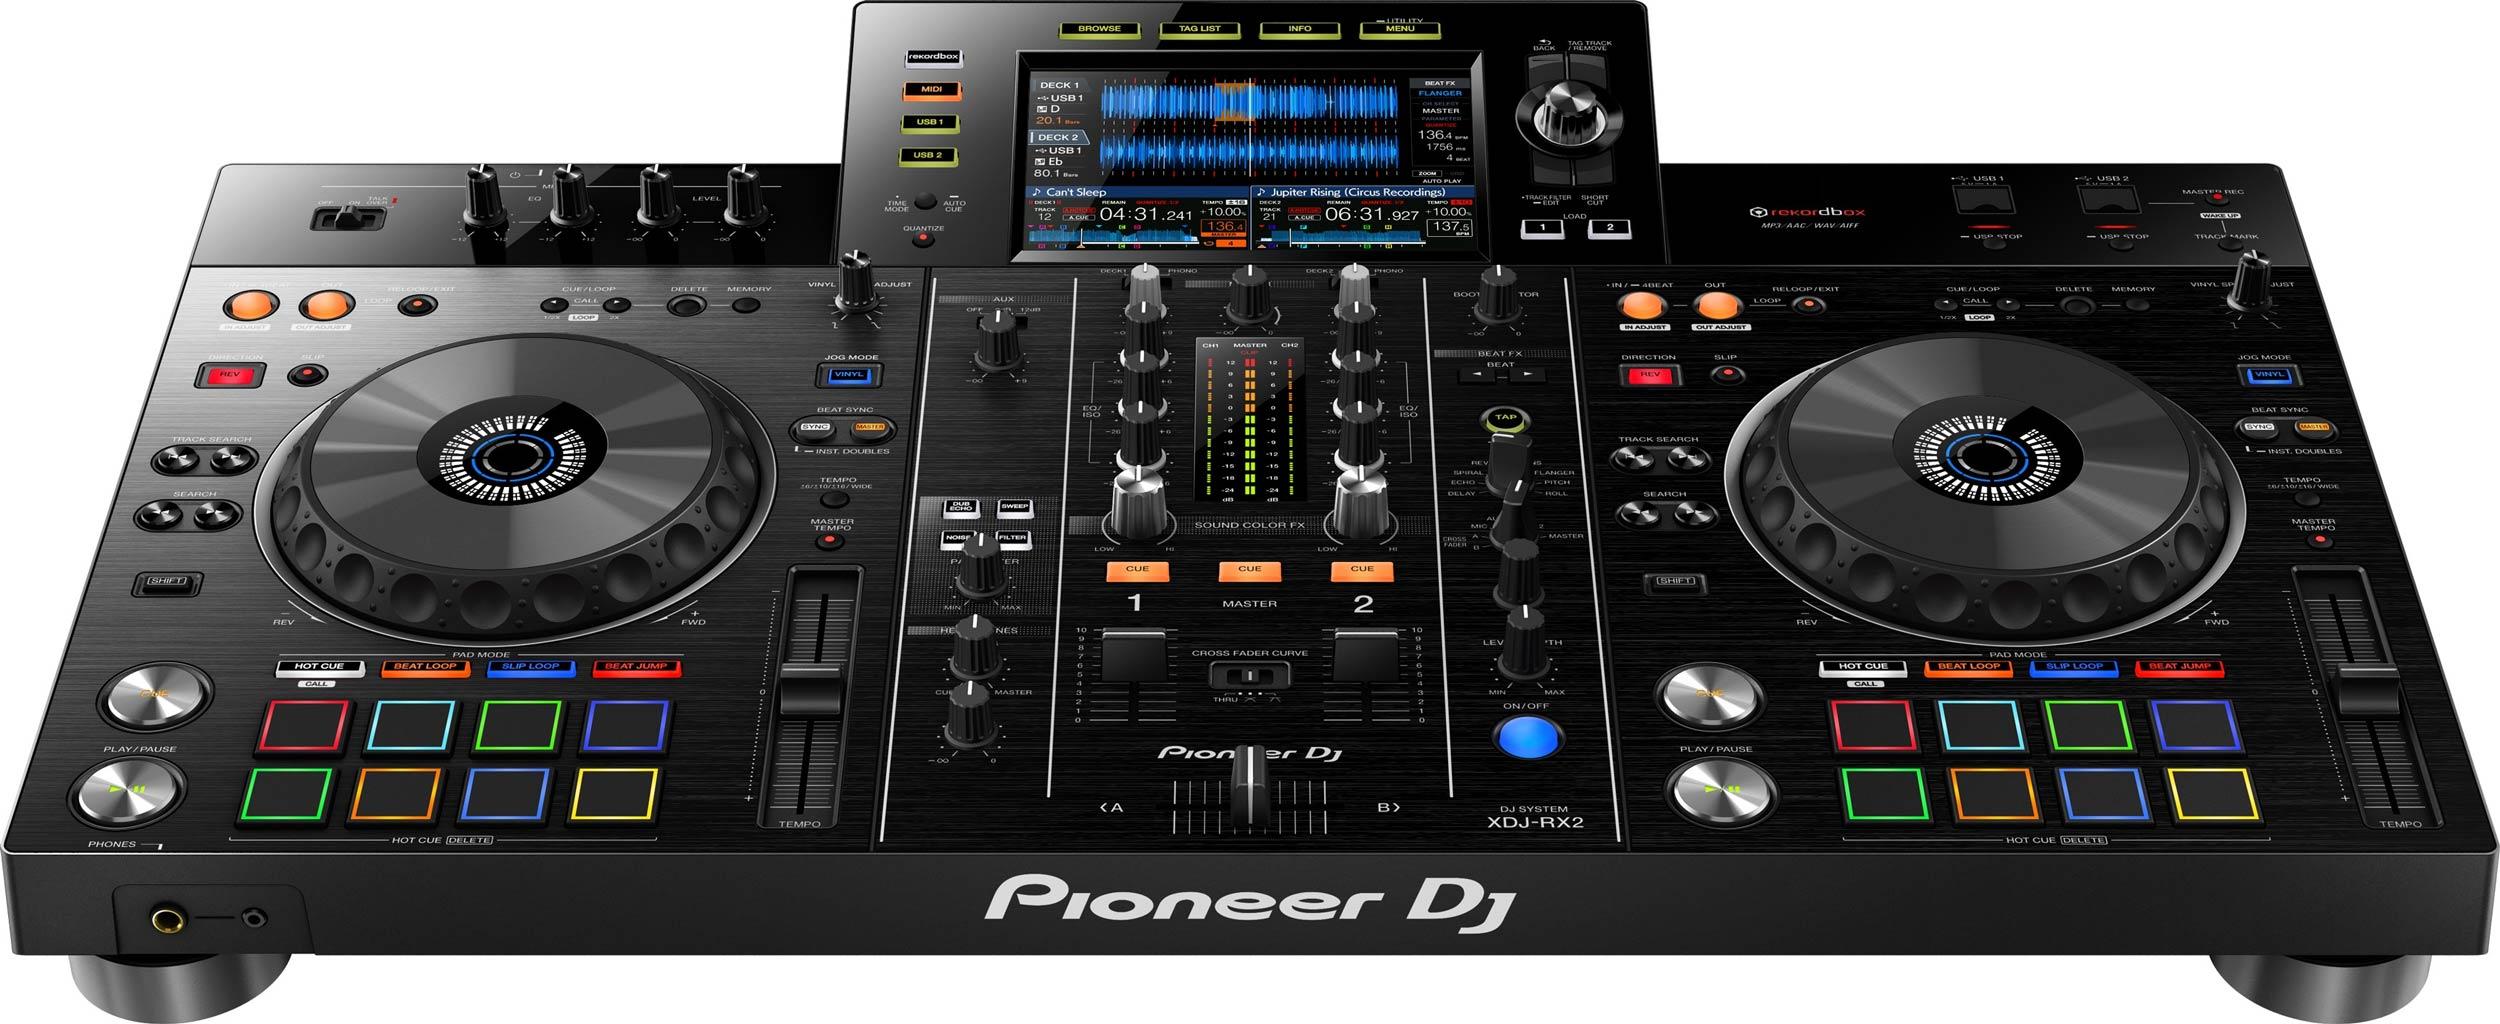 How To Set Table Pioneer Dj Xdj Rx2 Rekordbox Dj Controller Agiprodj